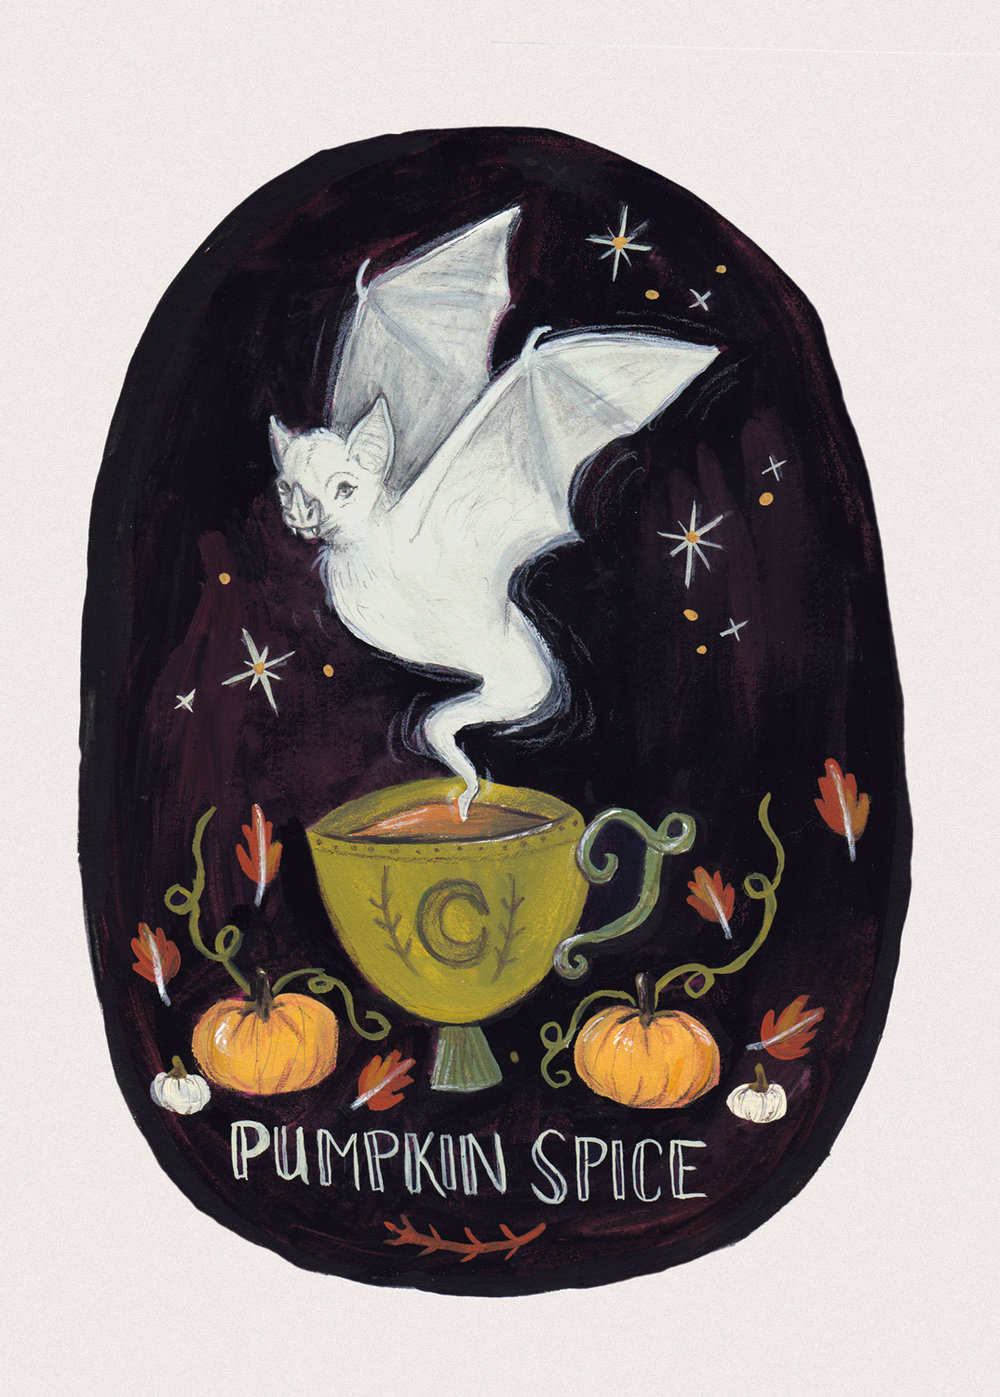 Pumpkin Spice Ghostea